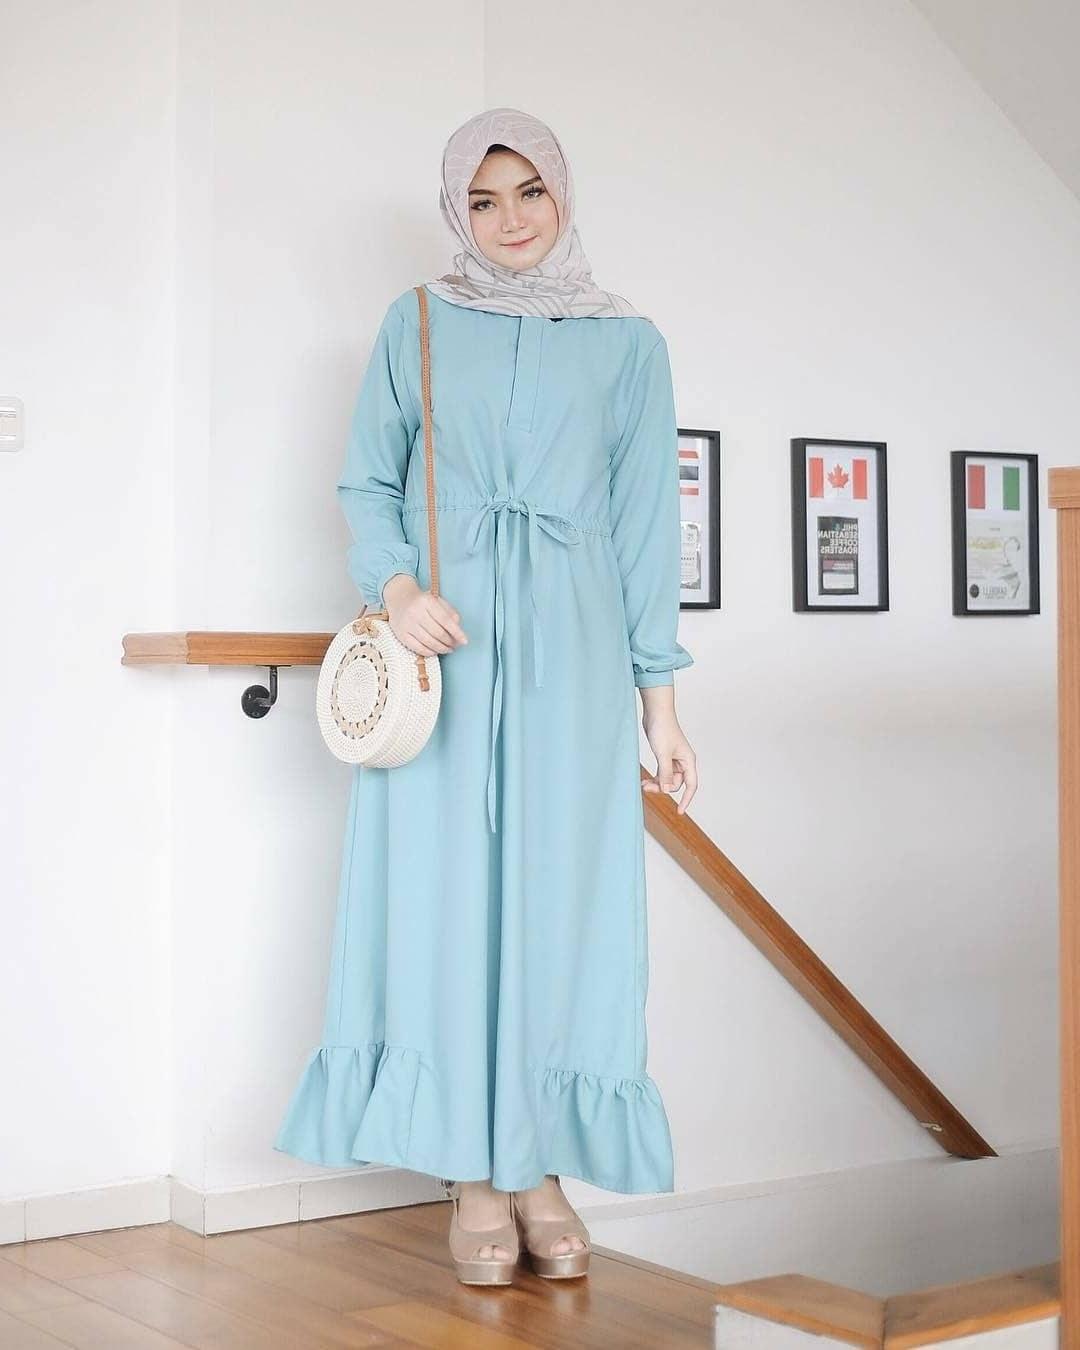 Inspirasi Model Baju Lebaran Perempuan 2018 Q5df Tren Busana Muslim Terbaru Untuk Merayakan Hari Raya Yang